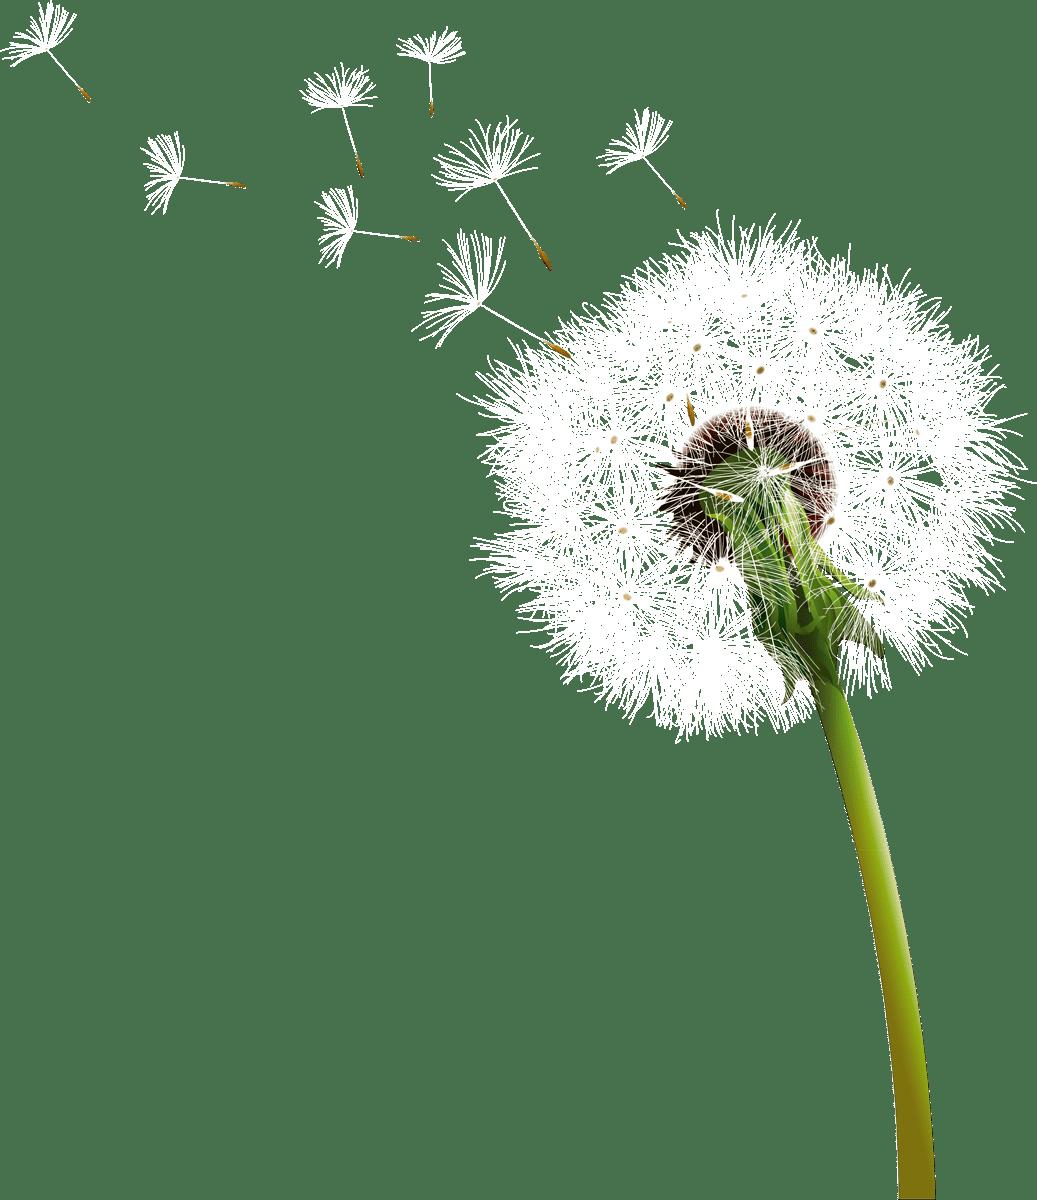 Dandelion high resolution